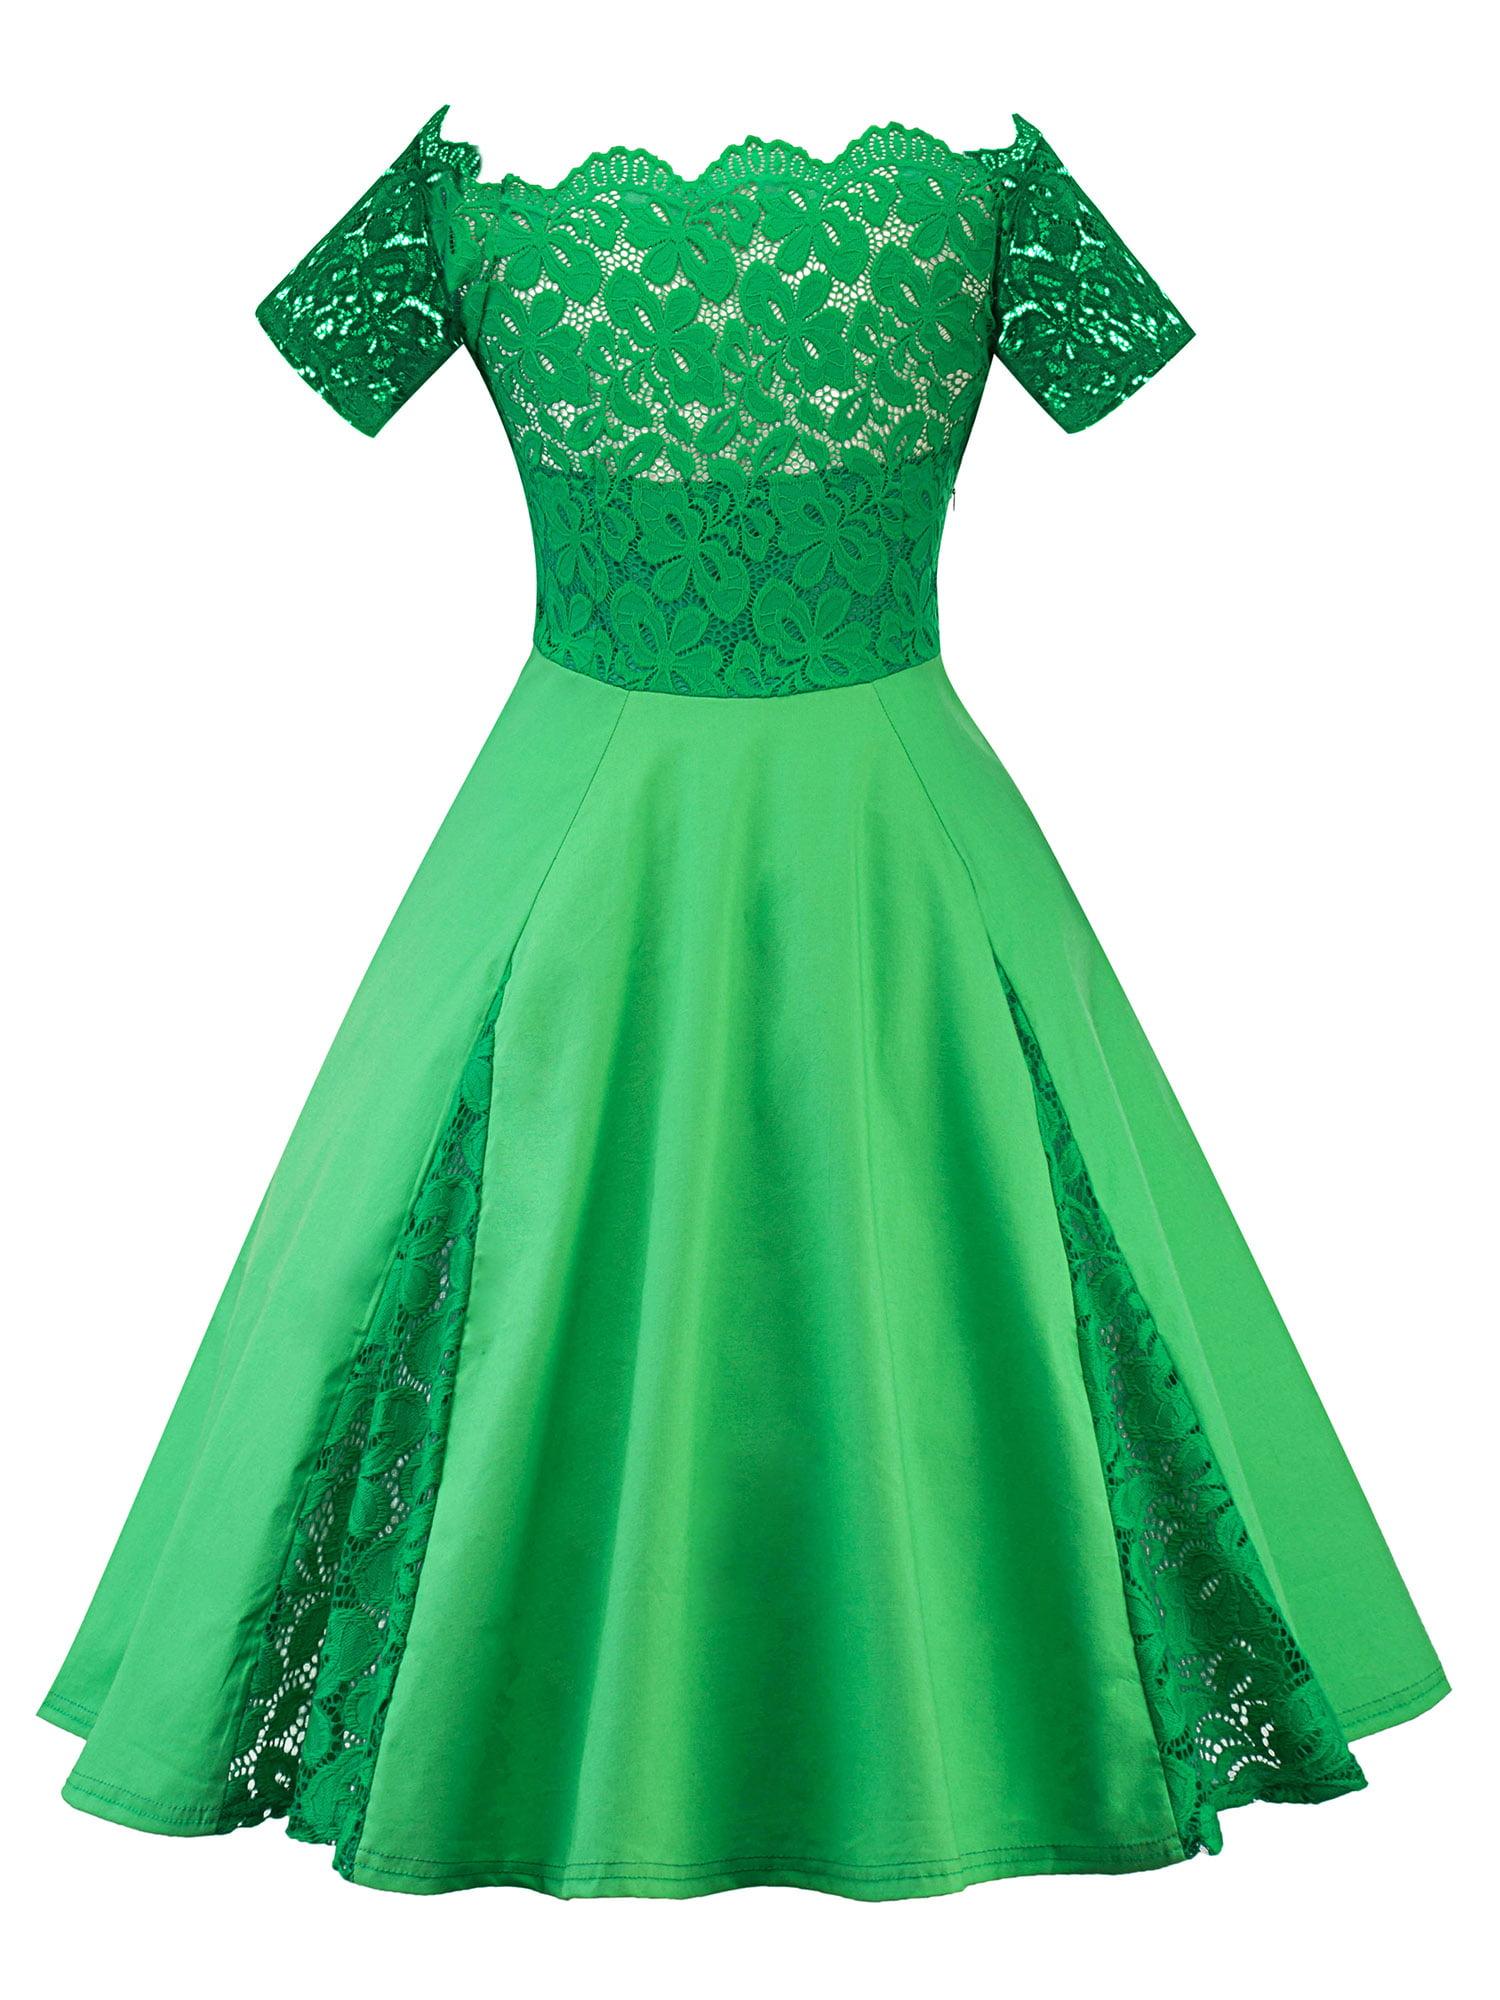 Vintage Women 50s Rockabilly Lace Off Shoulder Evening Party Prom Swing Dress